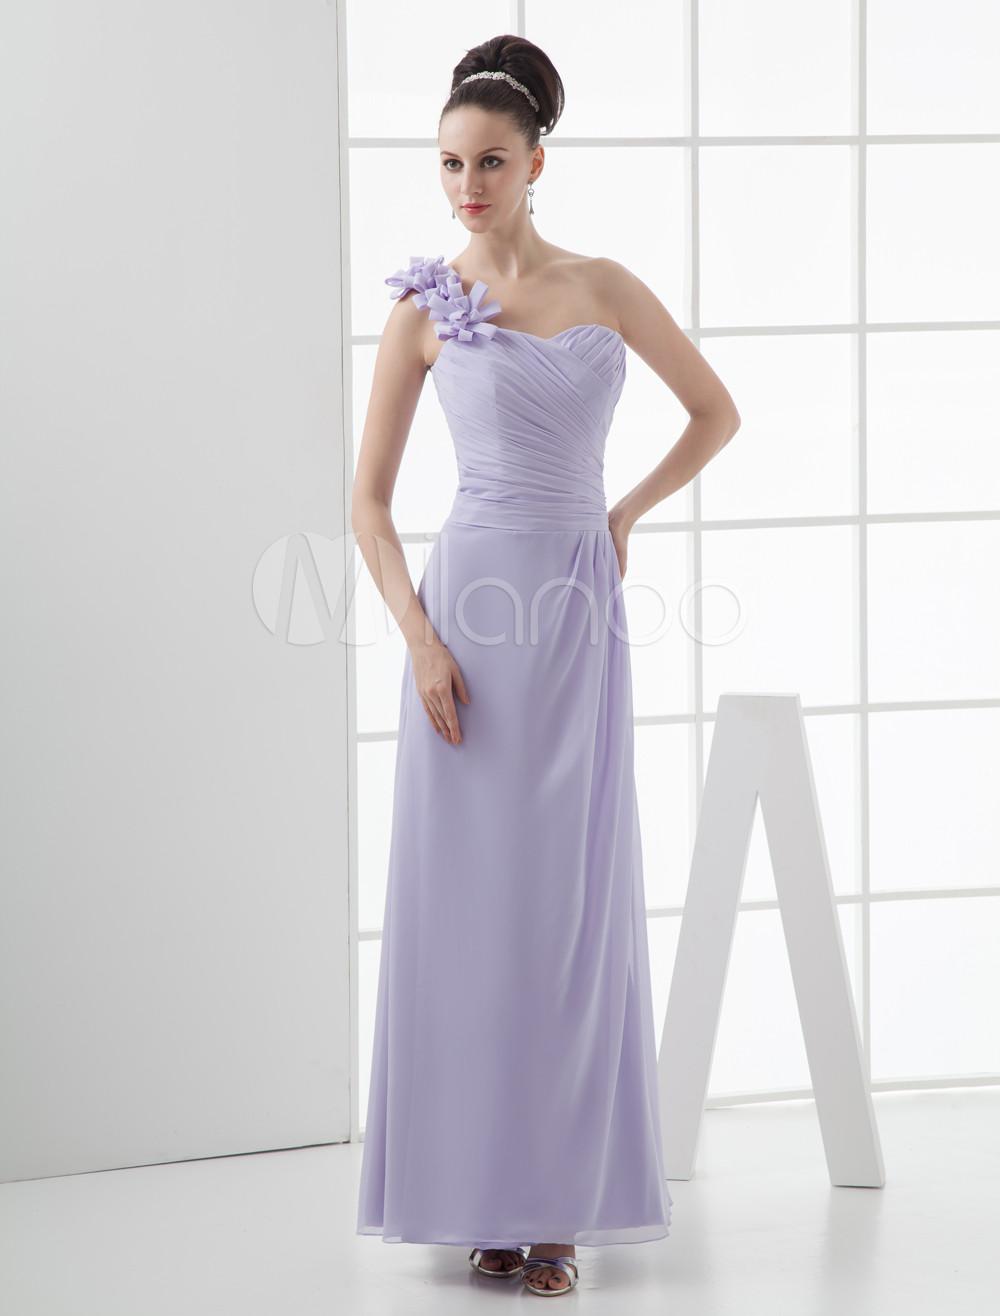 Lavender Floor Length One-Shoulder Matte Satin Chiffon Bridesmaid Dress